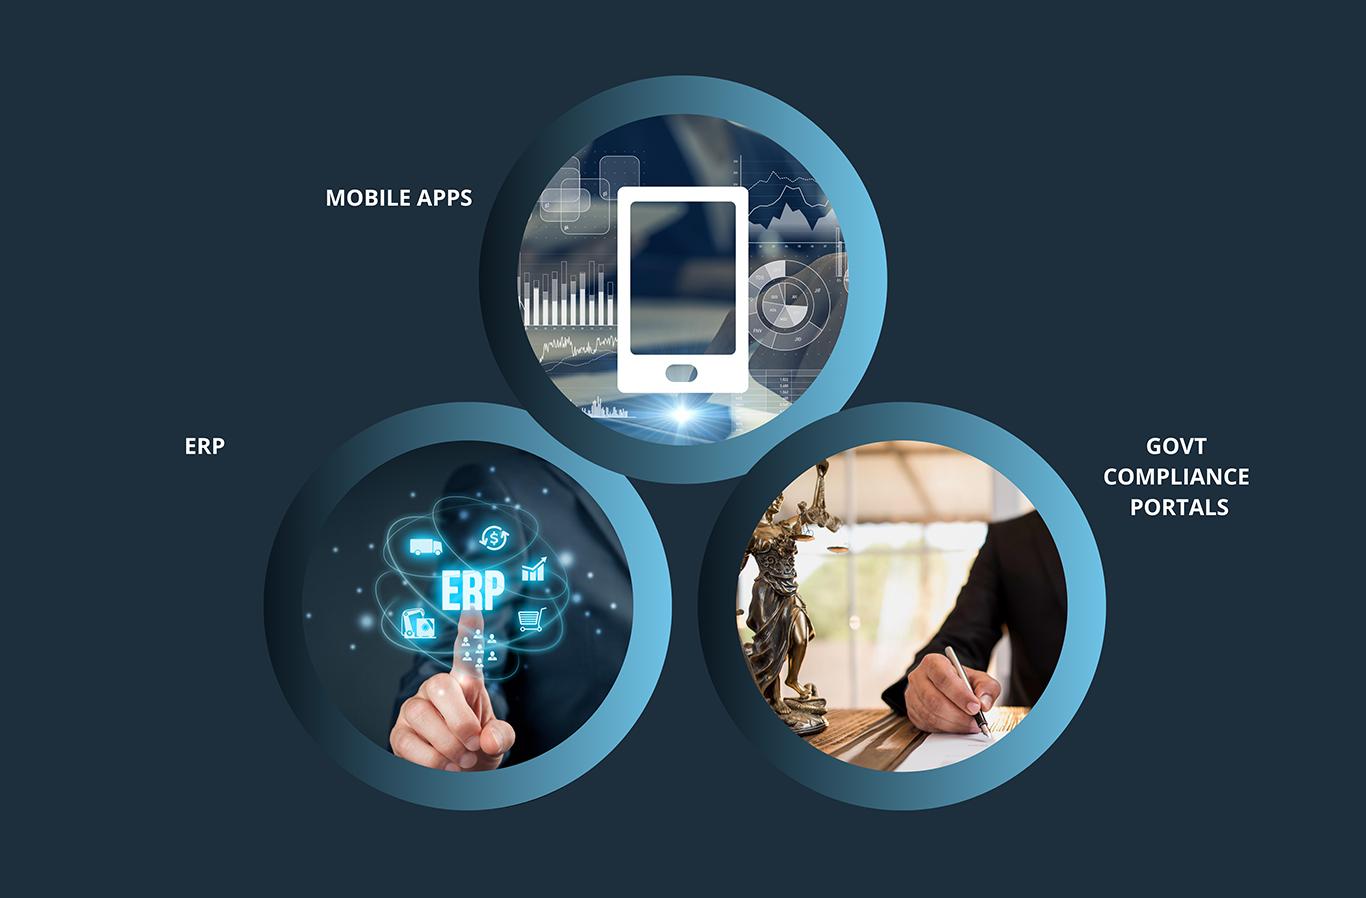 ITOrizon Outcome, Mobile Apps, ERP, Govt Compliance